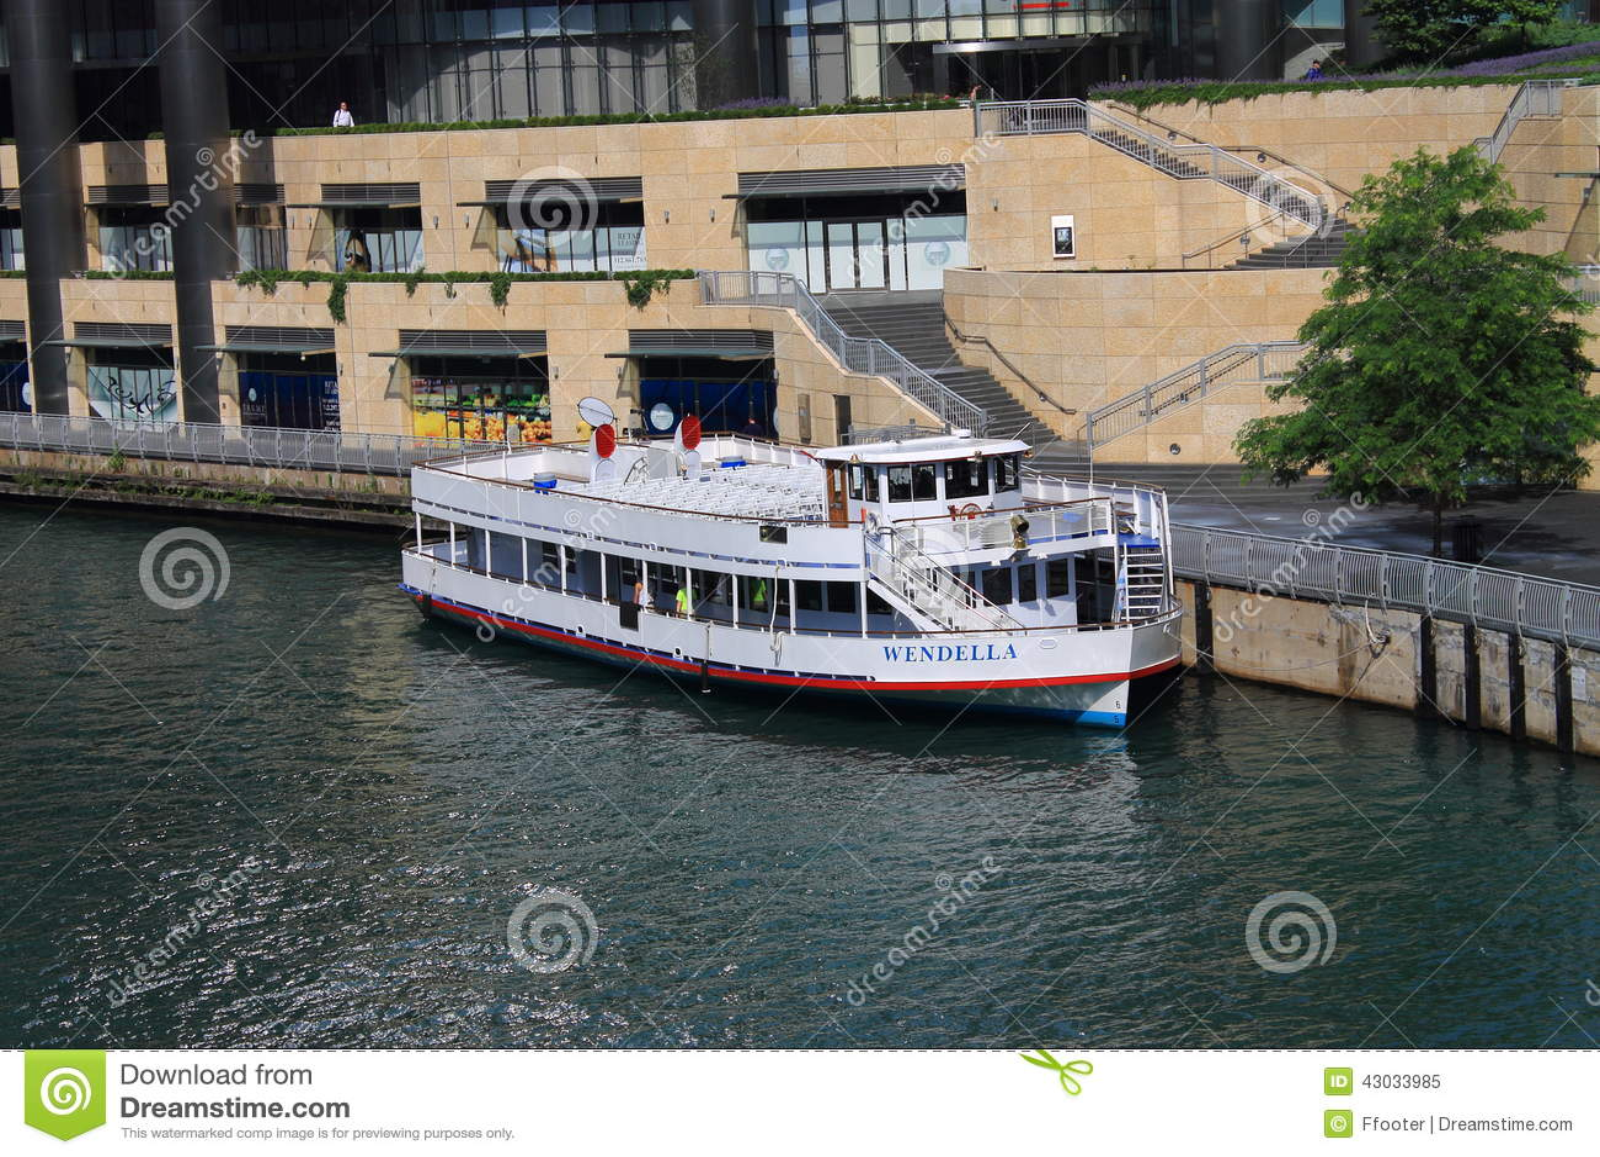 Wendella Boat Tour Time